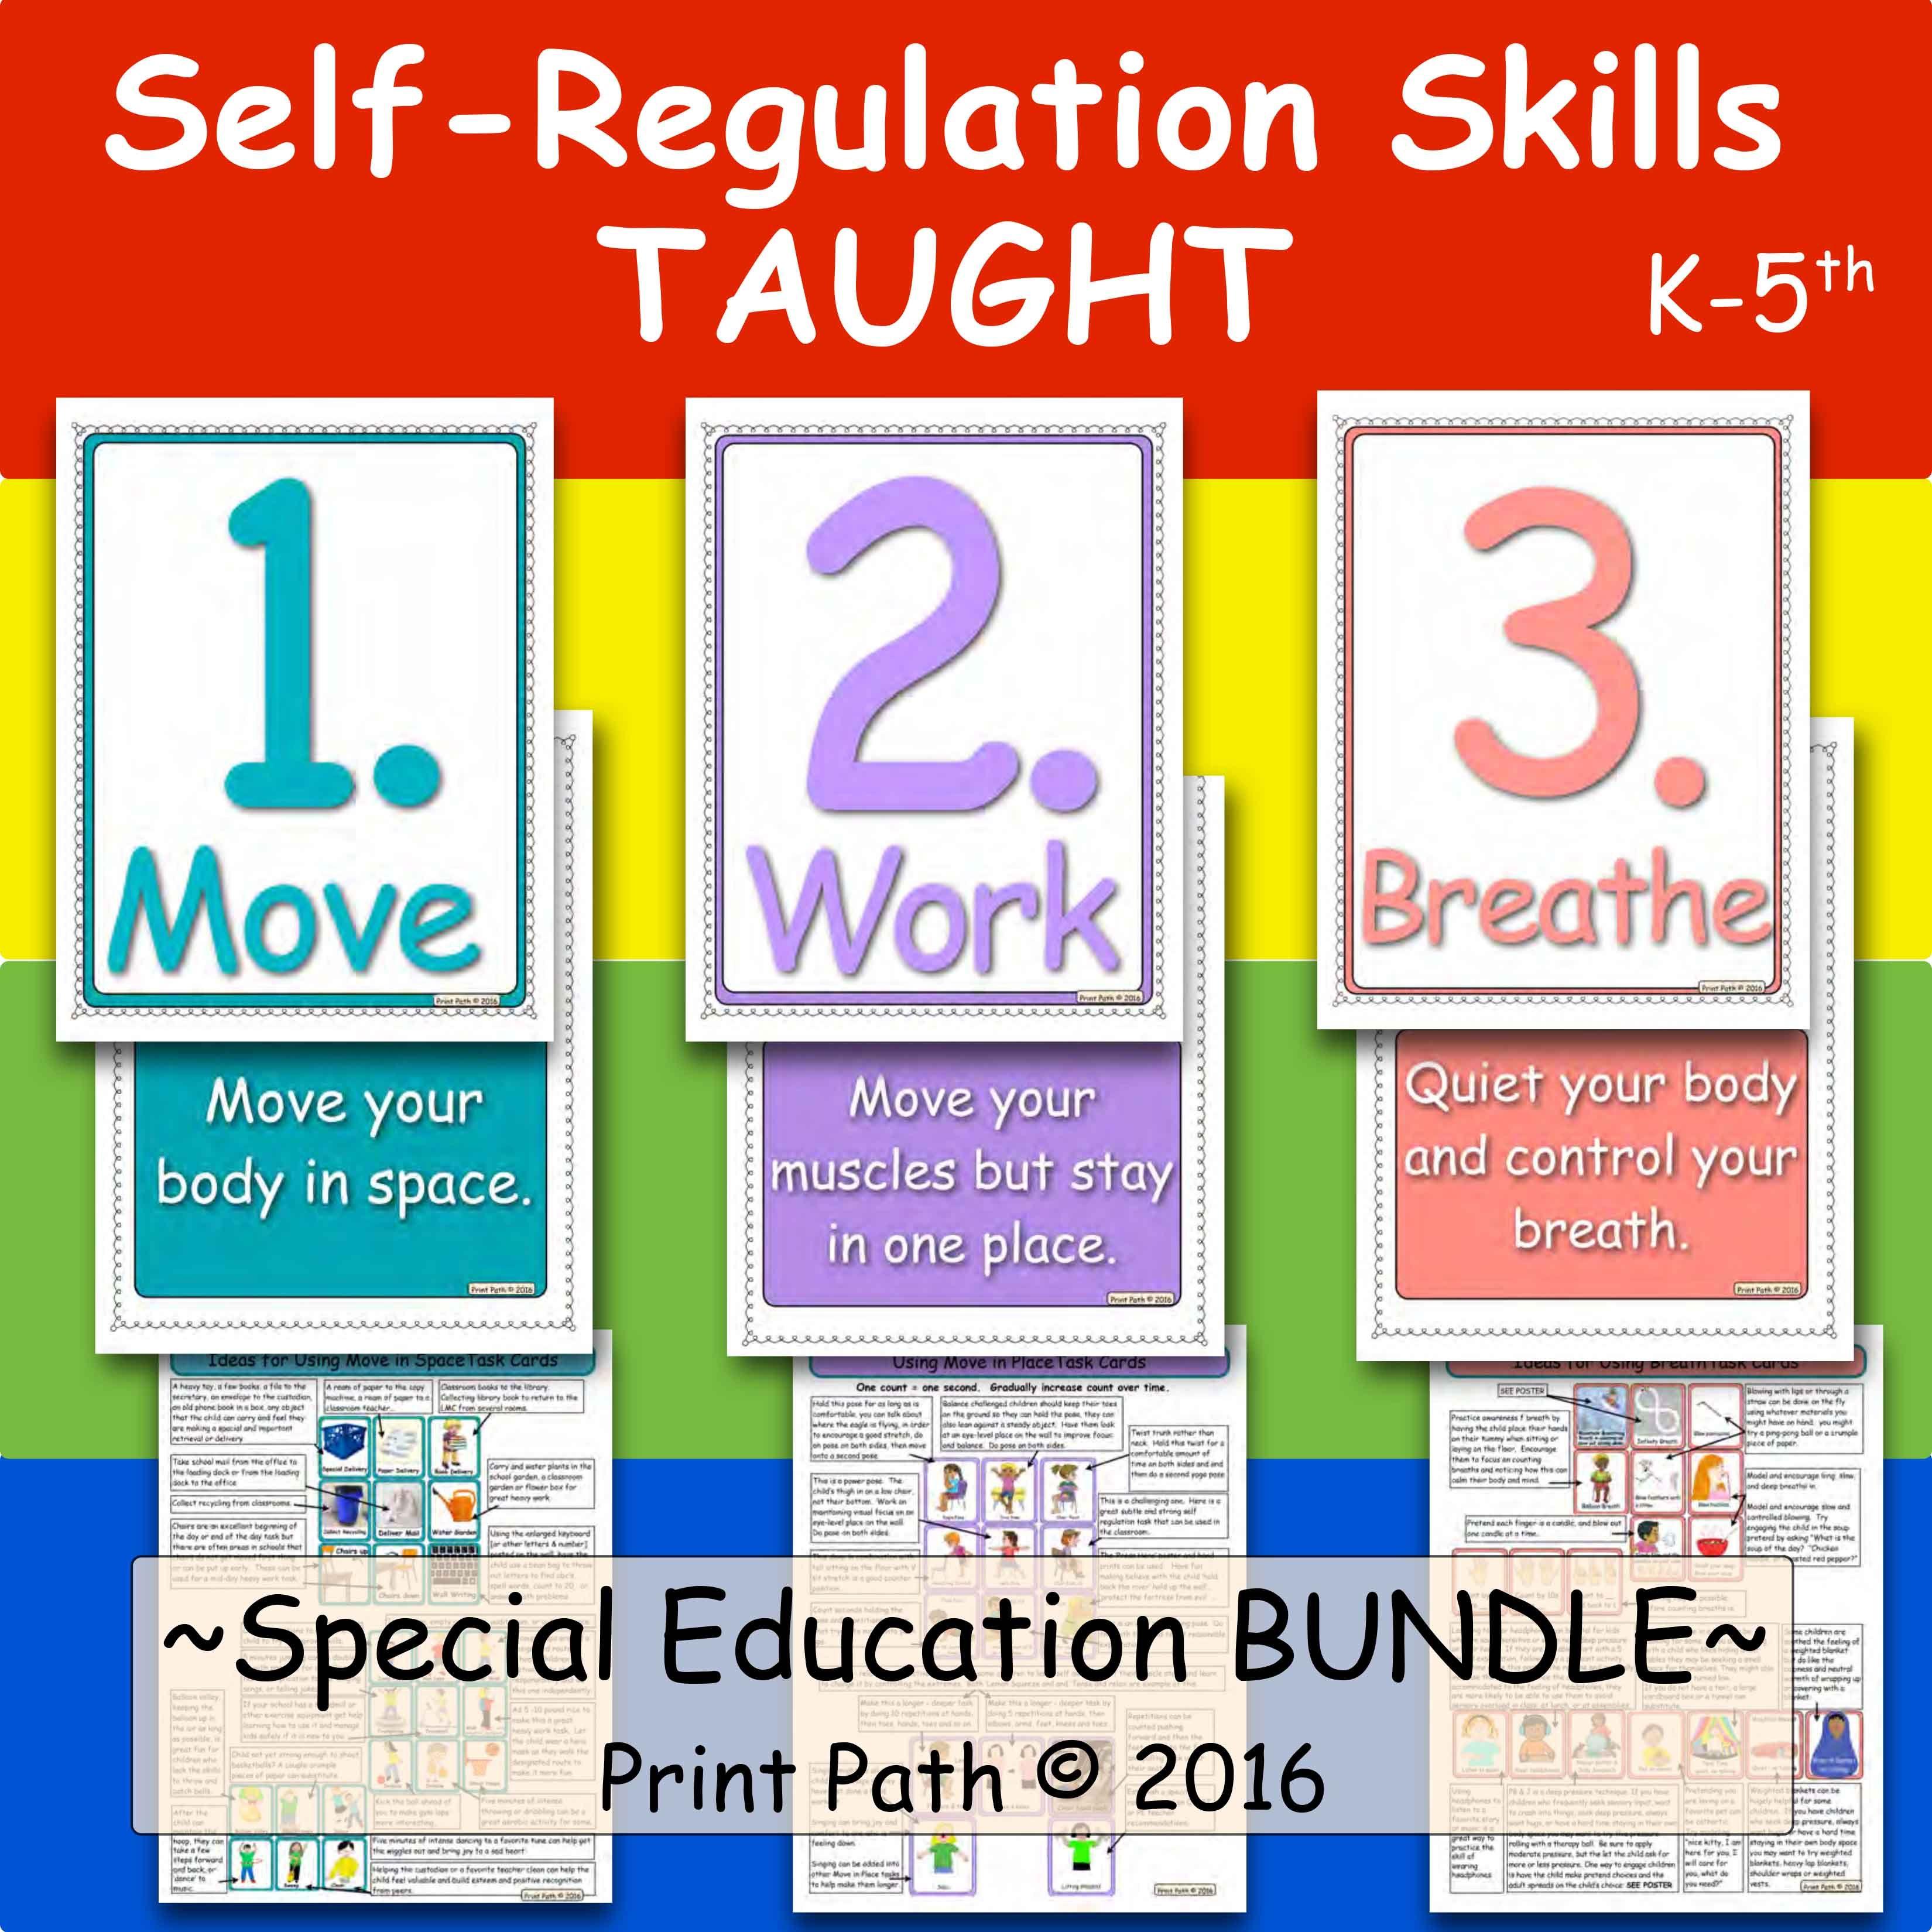 Self-Regulation Skills TAUGHT | Teaching Motivation ...